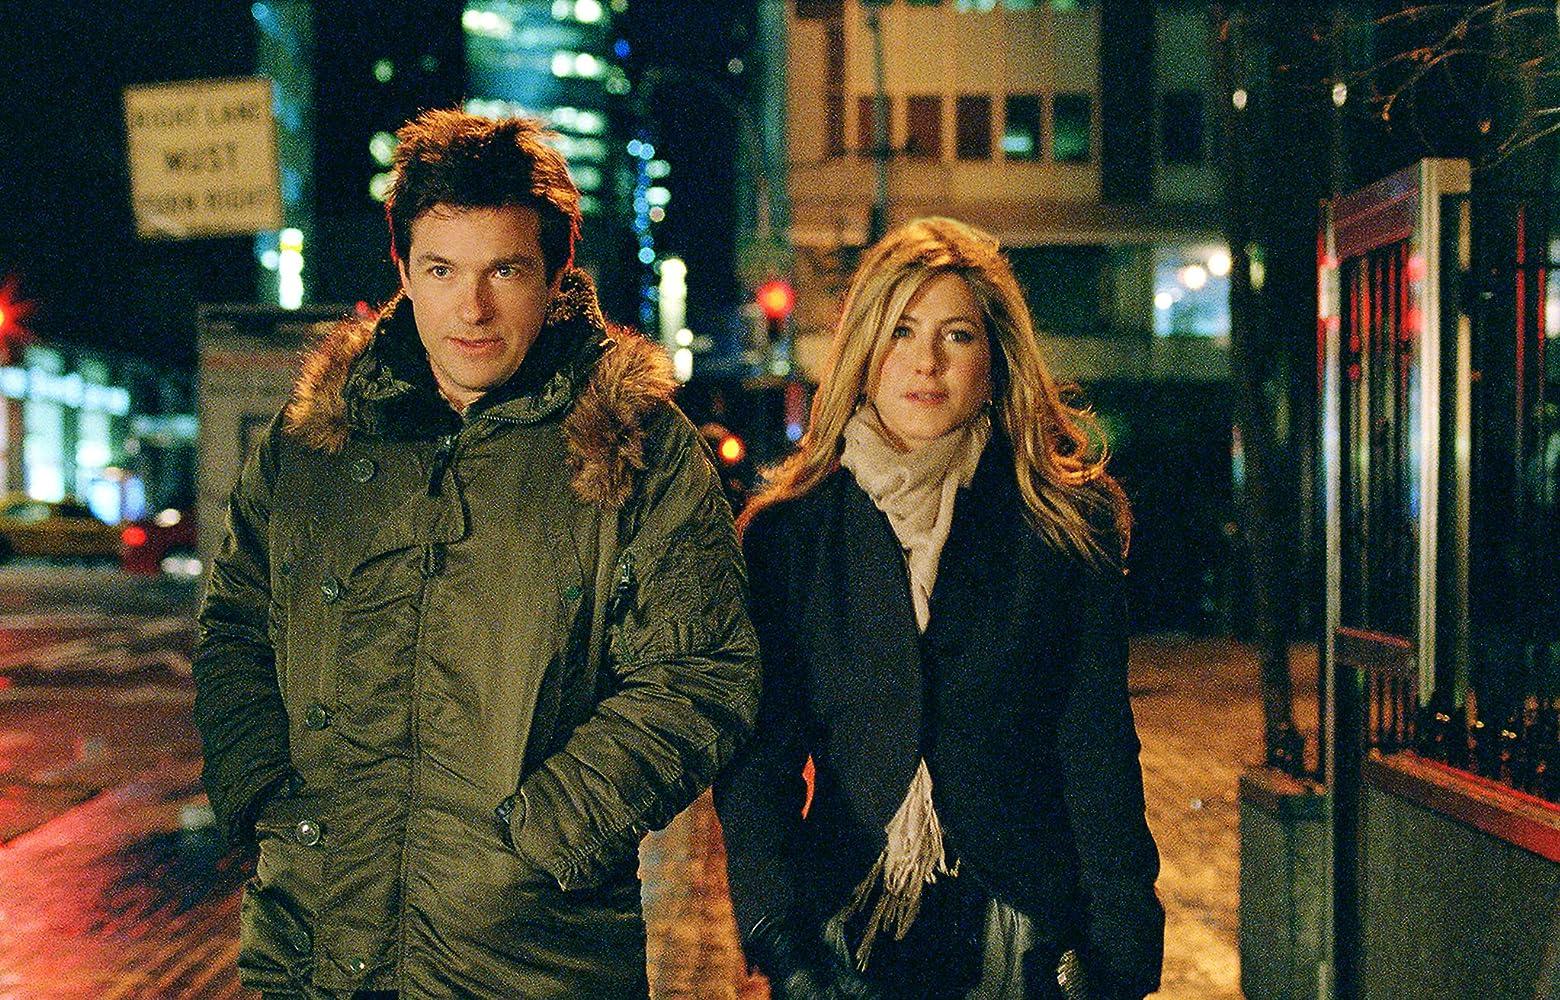 Jennifer Aniston and Jason Bateman in The Switch (2010)